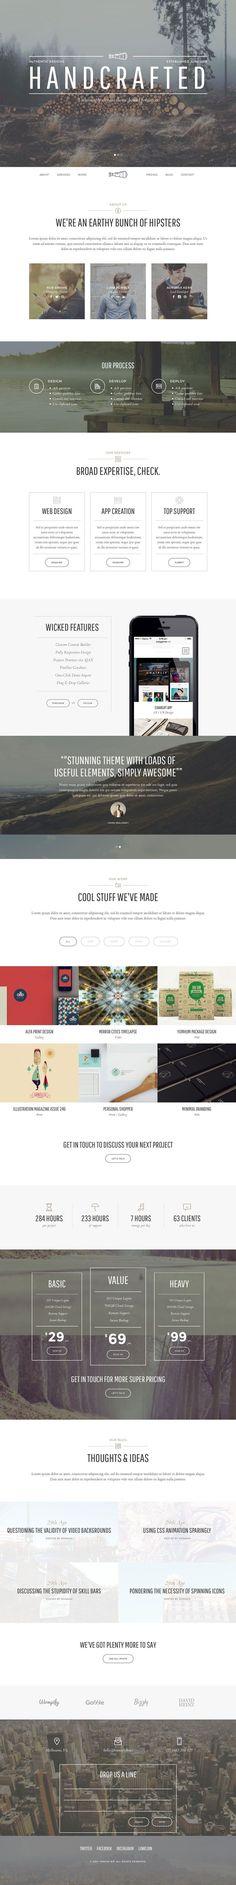 Loves Data Loves || Thread - Multi-Purpose Theme, modern vintage | Hand Made | Web design | Website | Black and White | Photography #WebDesign